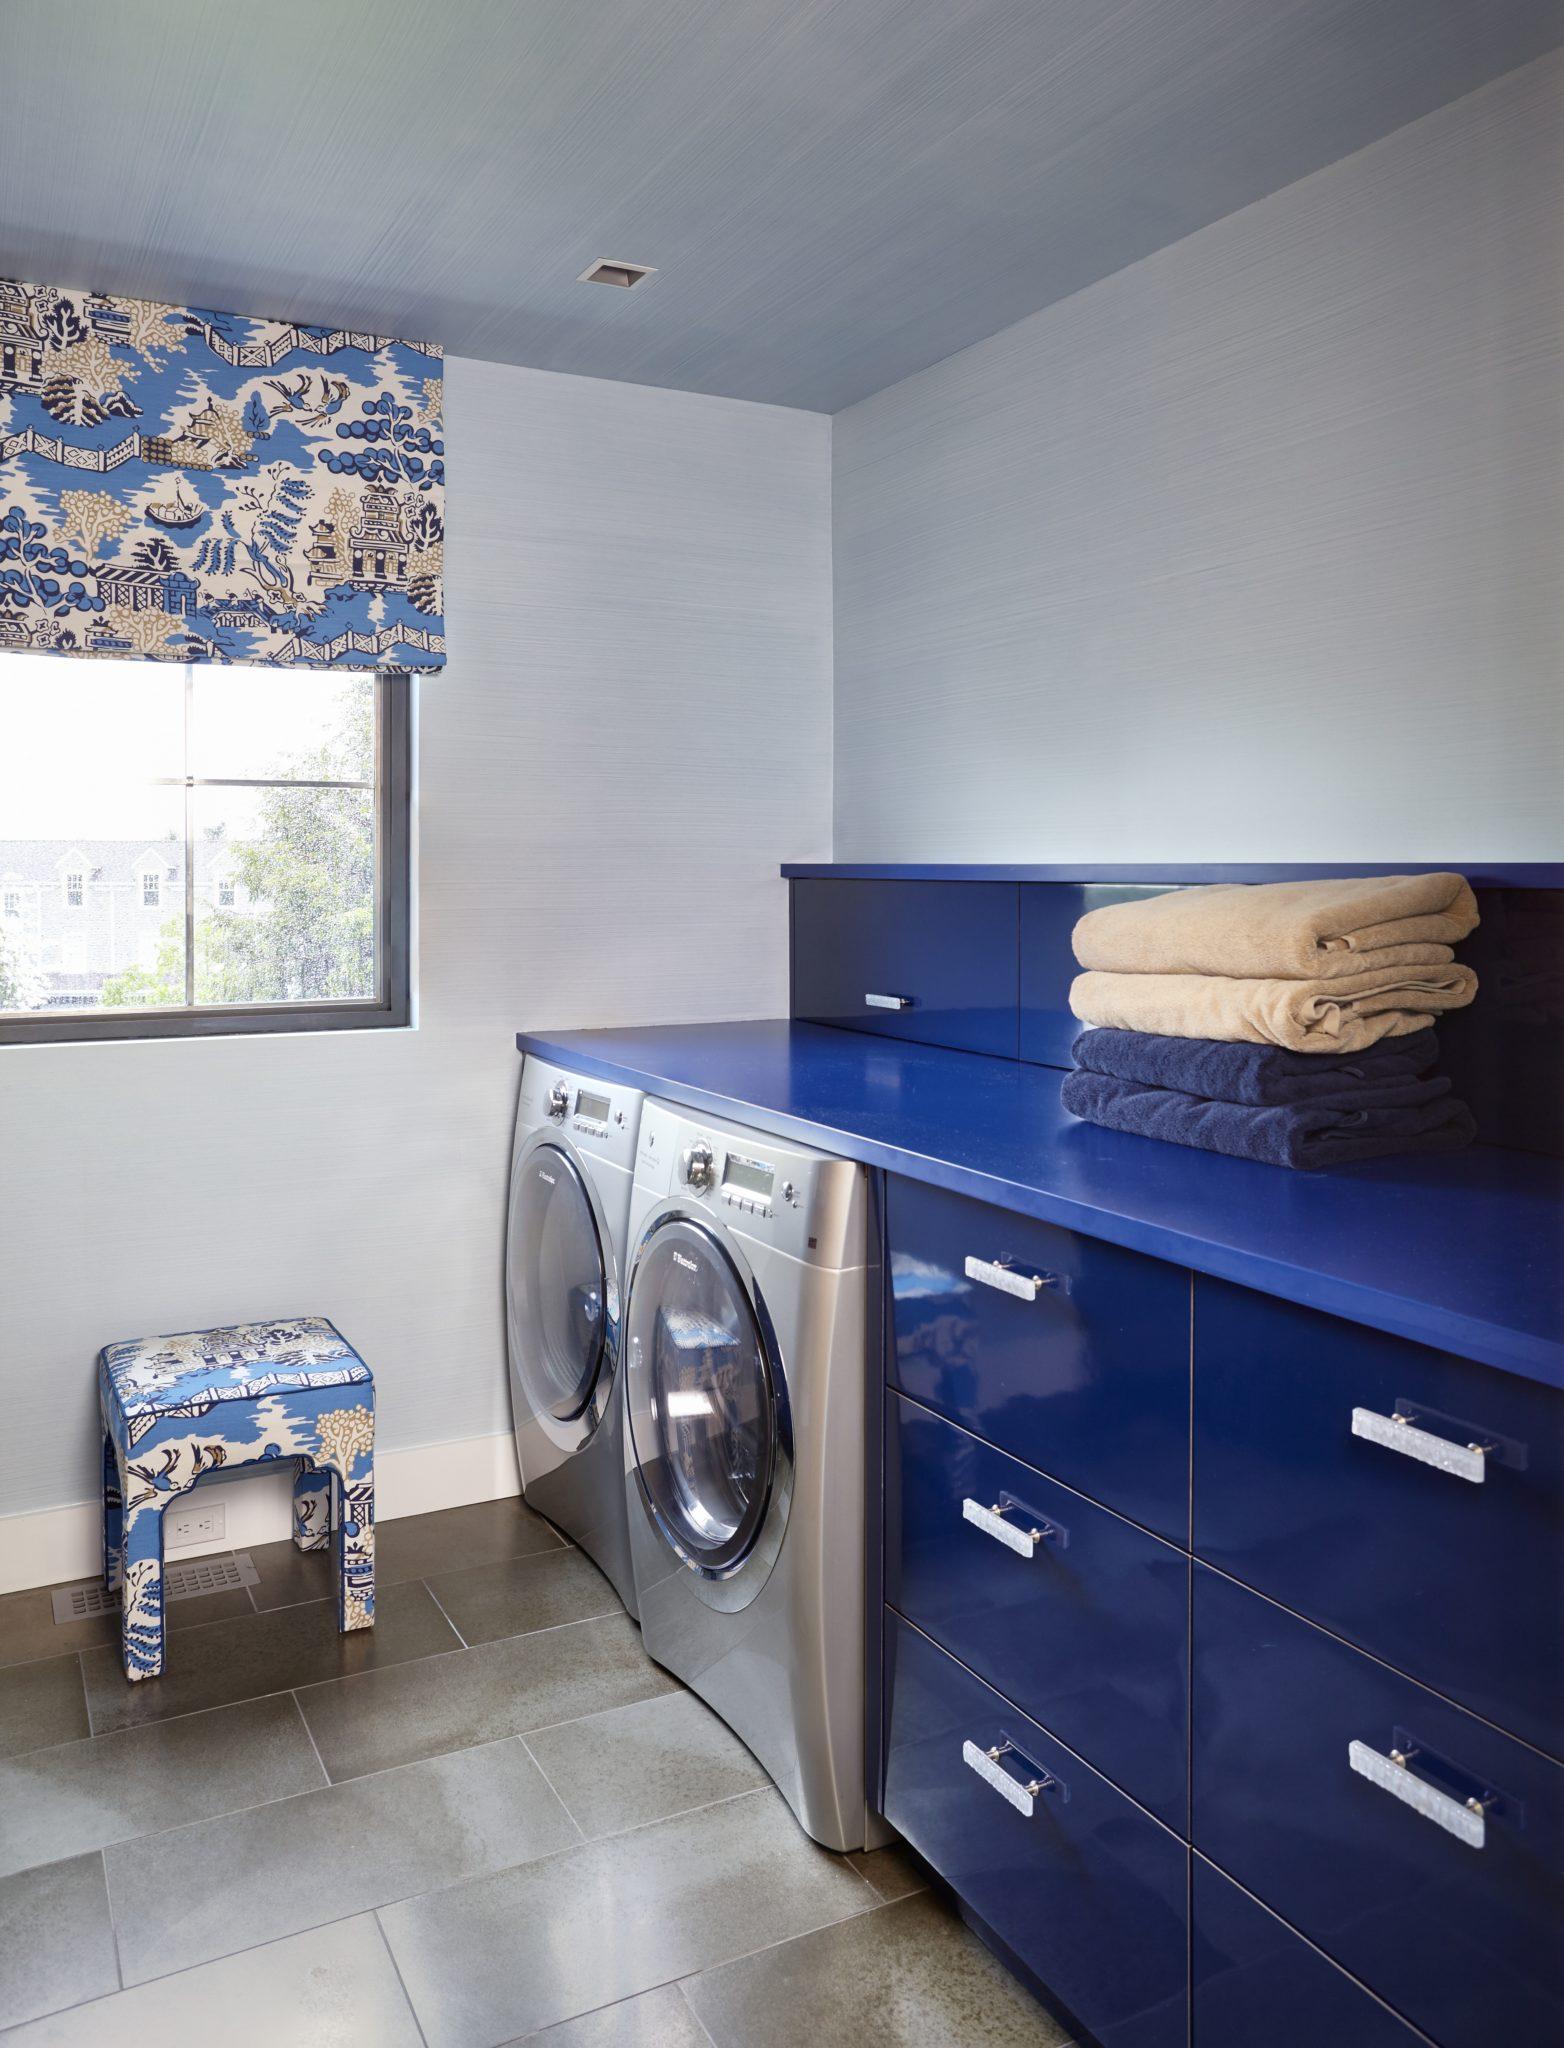 Laundry Room Striae Glazed Walls And Ceiling by Heidi Holzer Design & Decorative Work